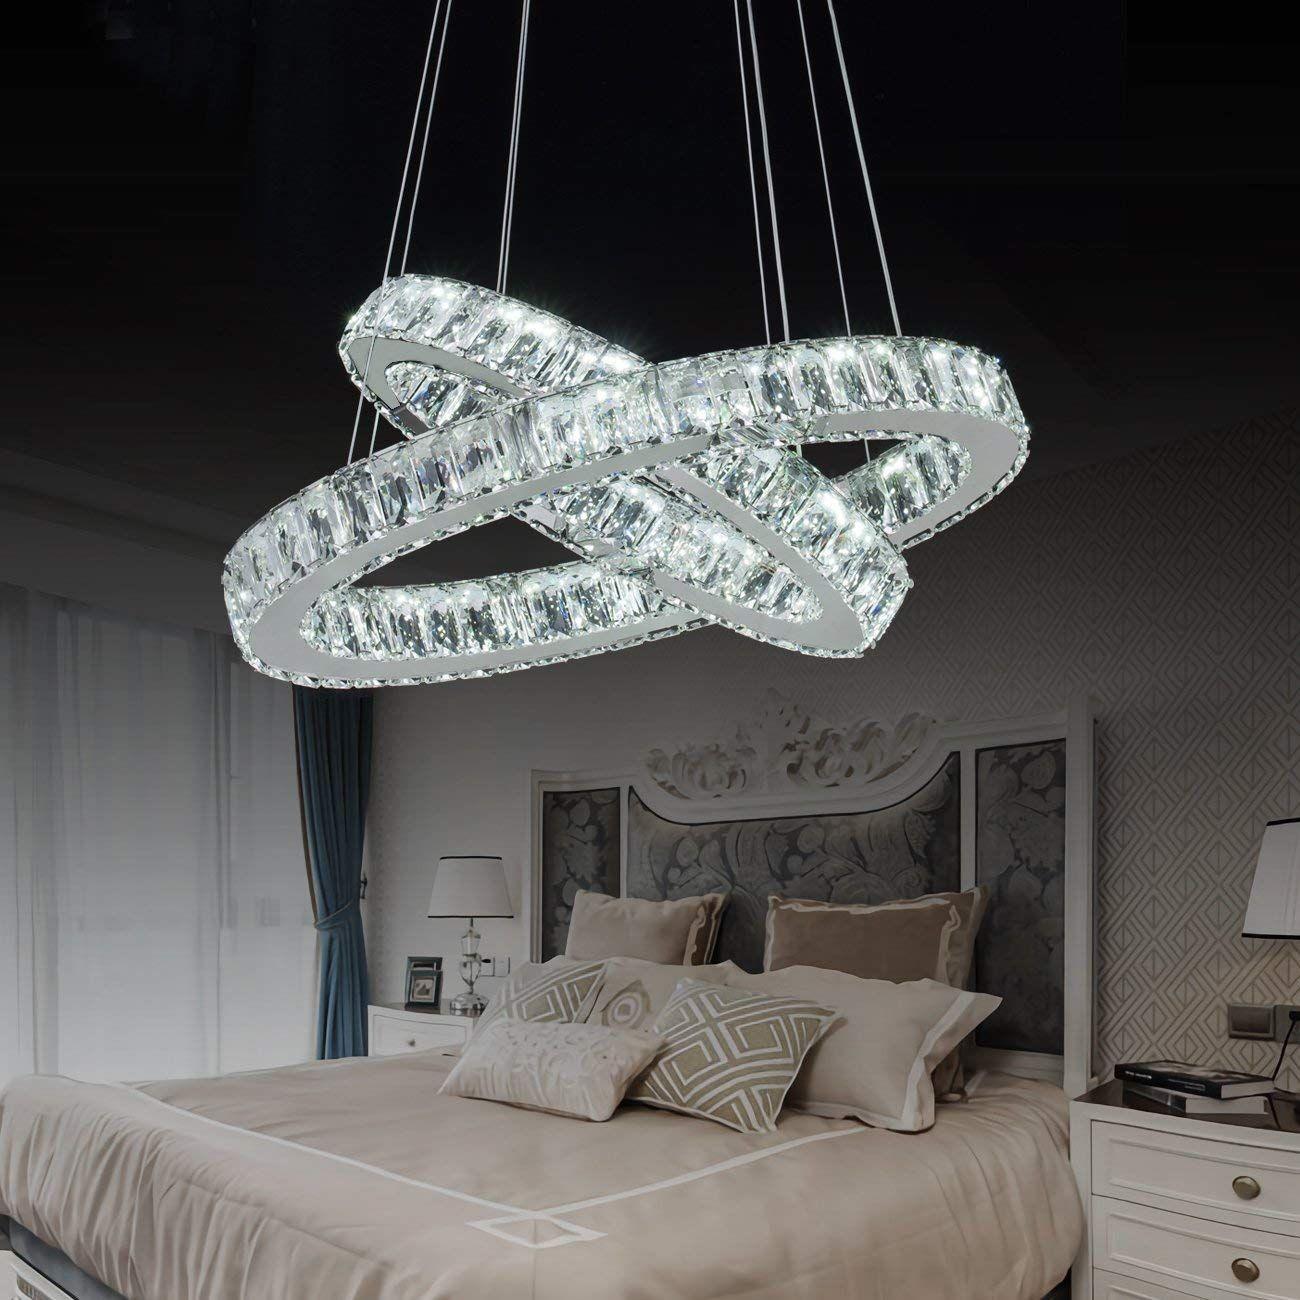 Modern Led Crystal Chandeliers 2 Rings Pendant Lighting Elegant Crystal Glass Ceiling Lighting Co Colorful Bedroom Decor Chandelier Design Glass Ceiling Lights